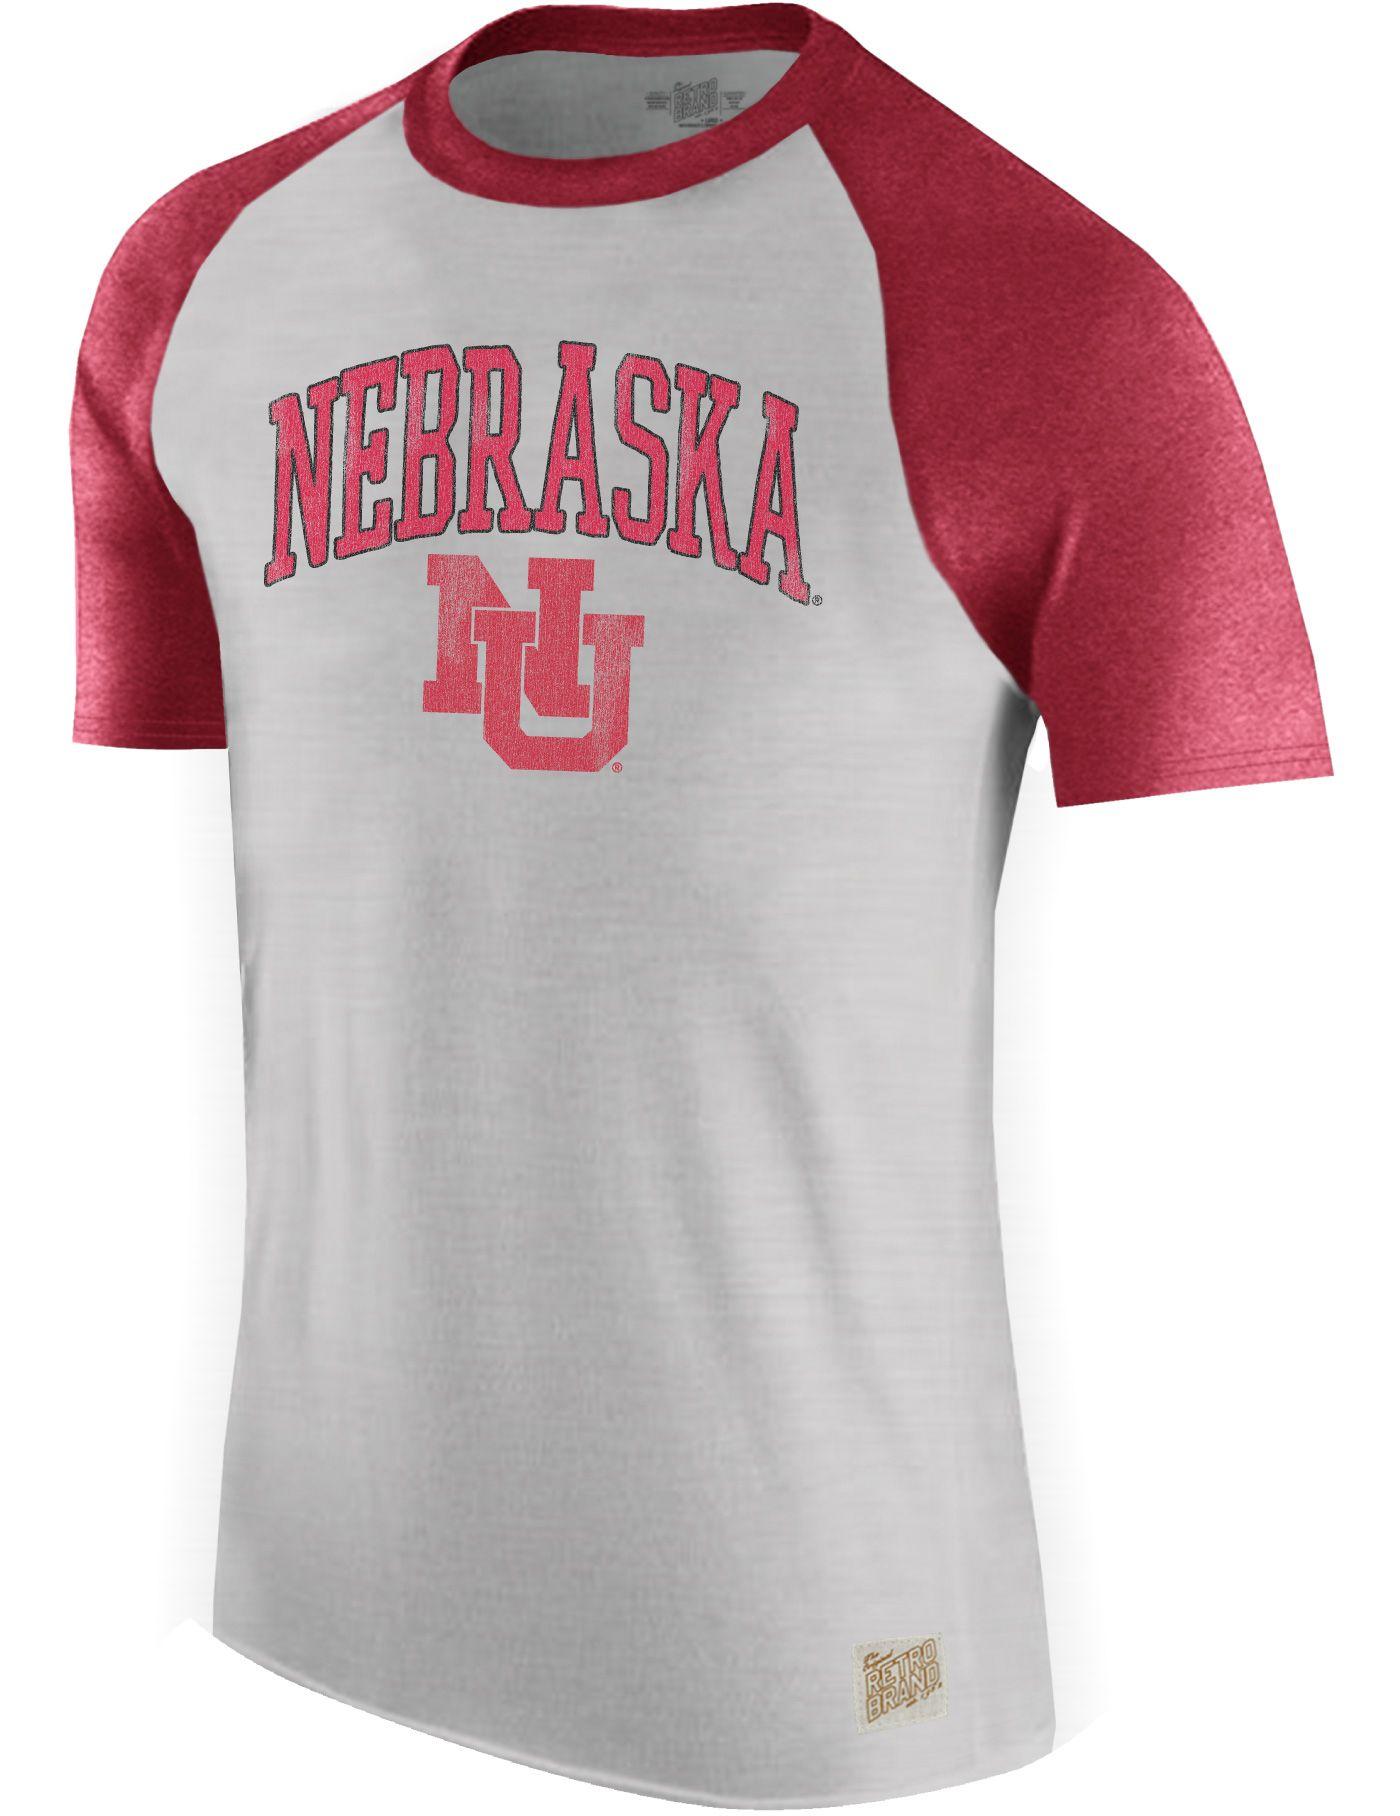 Original Retro Brand Men's Nebraska Cornhuskers Grey/Scarlet Raglan T-Shirt